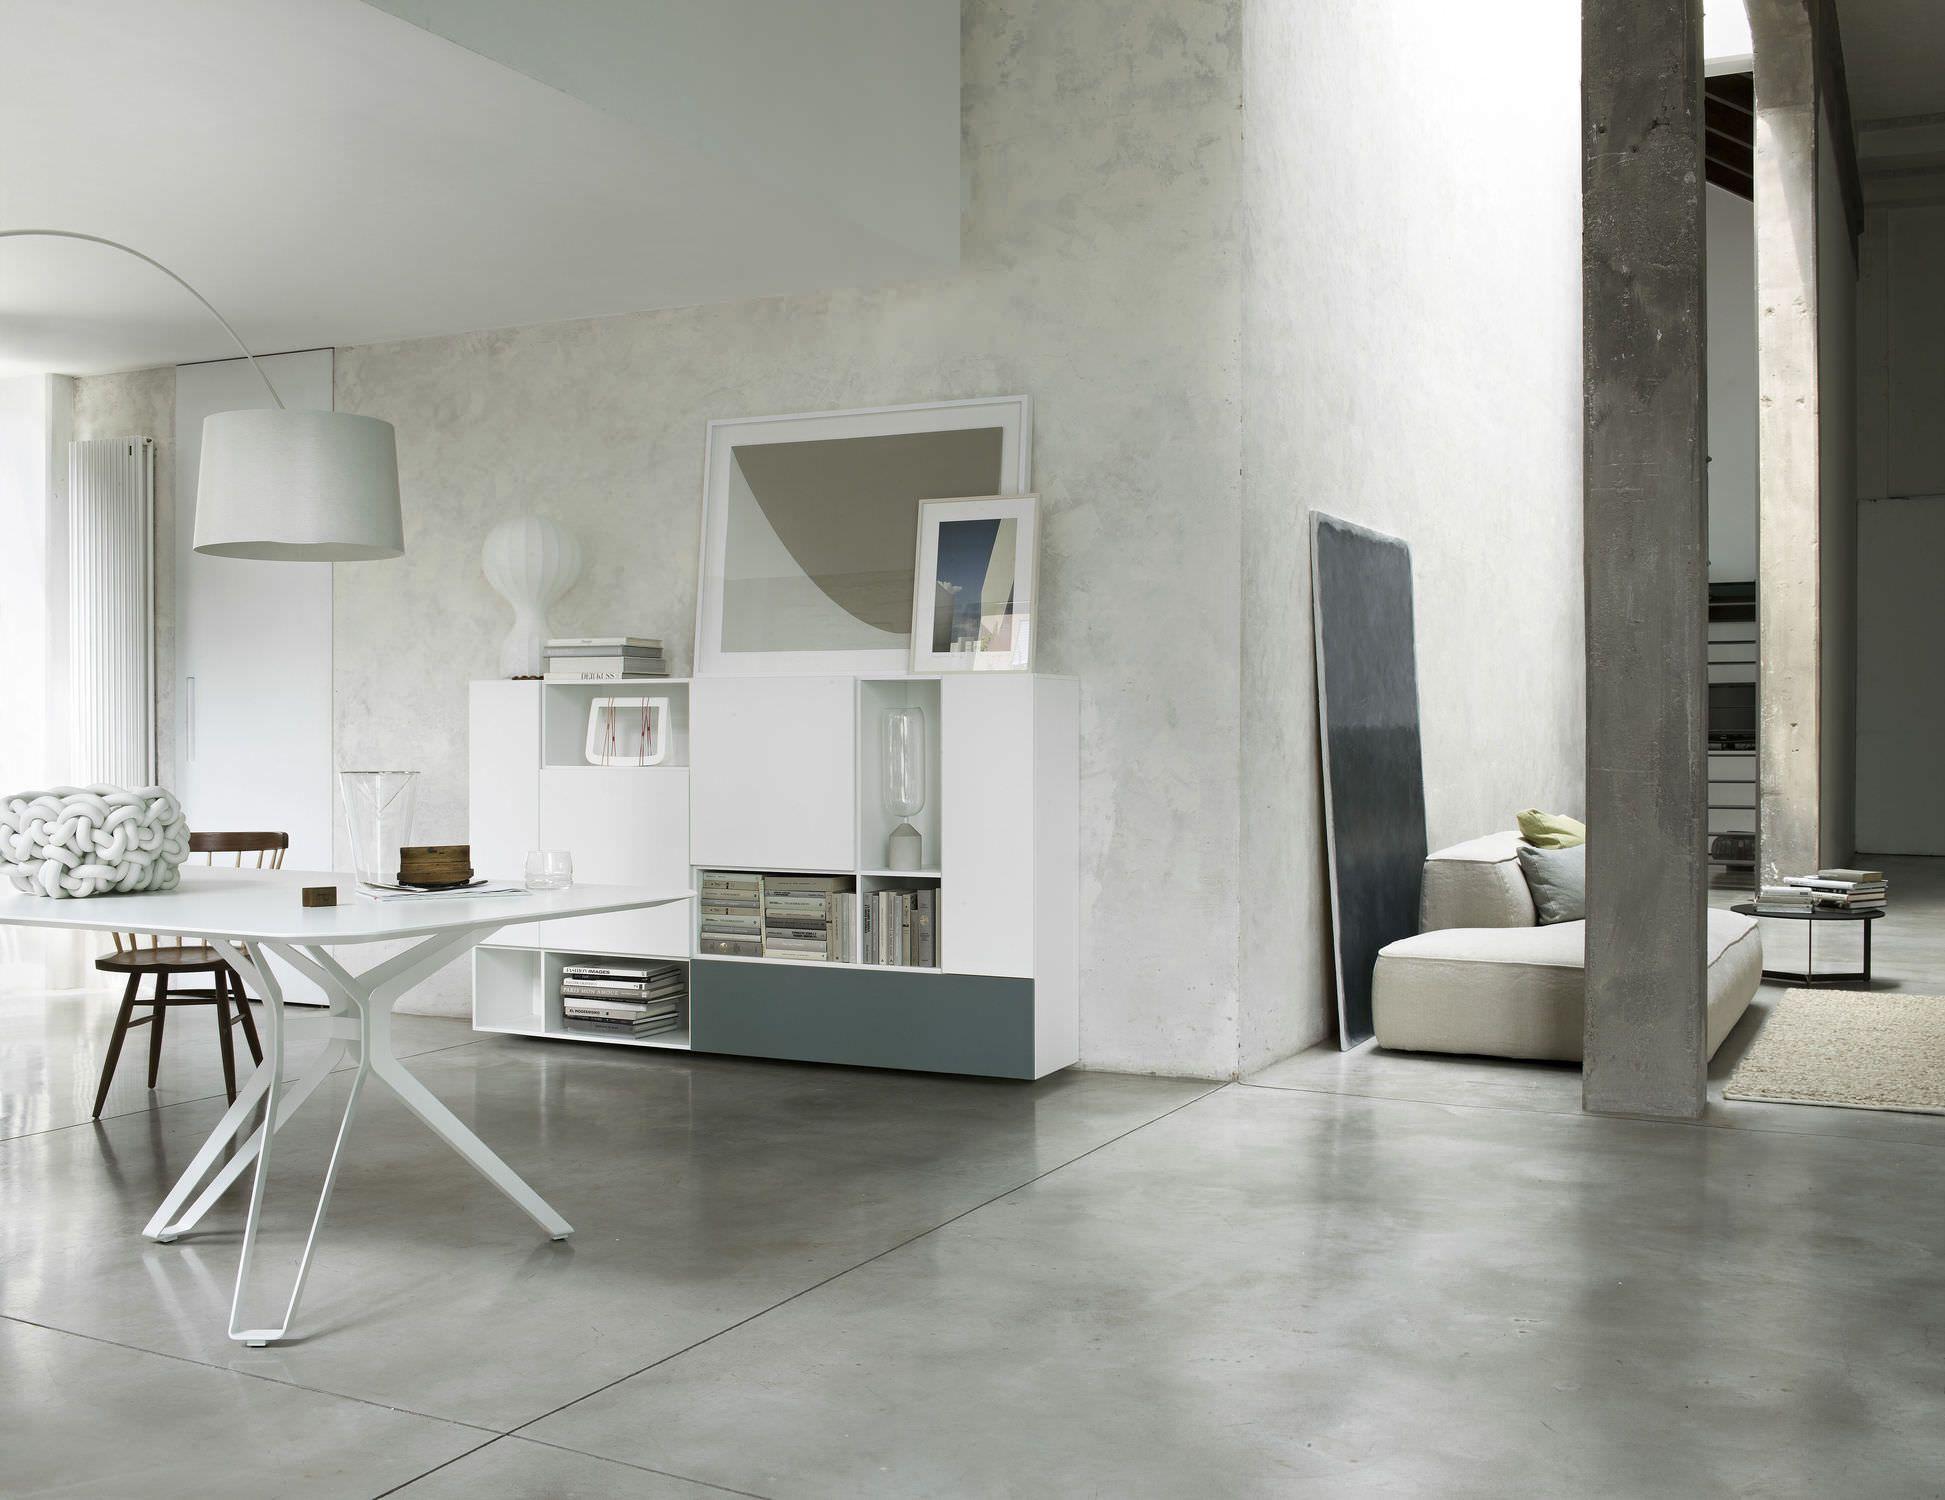 Living Room Living Room Contemporary Concrete Wall Open Space Amazing Contemporary Modern Living Room Design Ideas